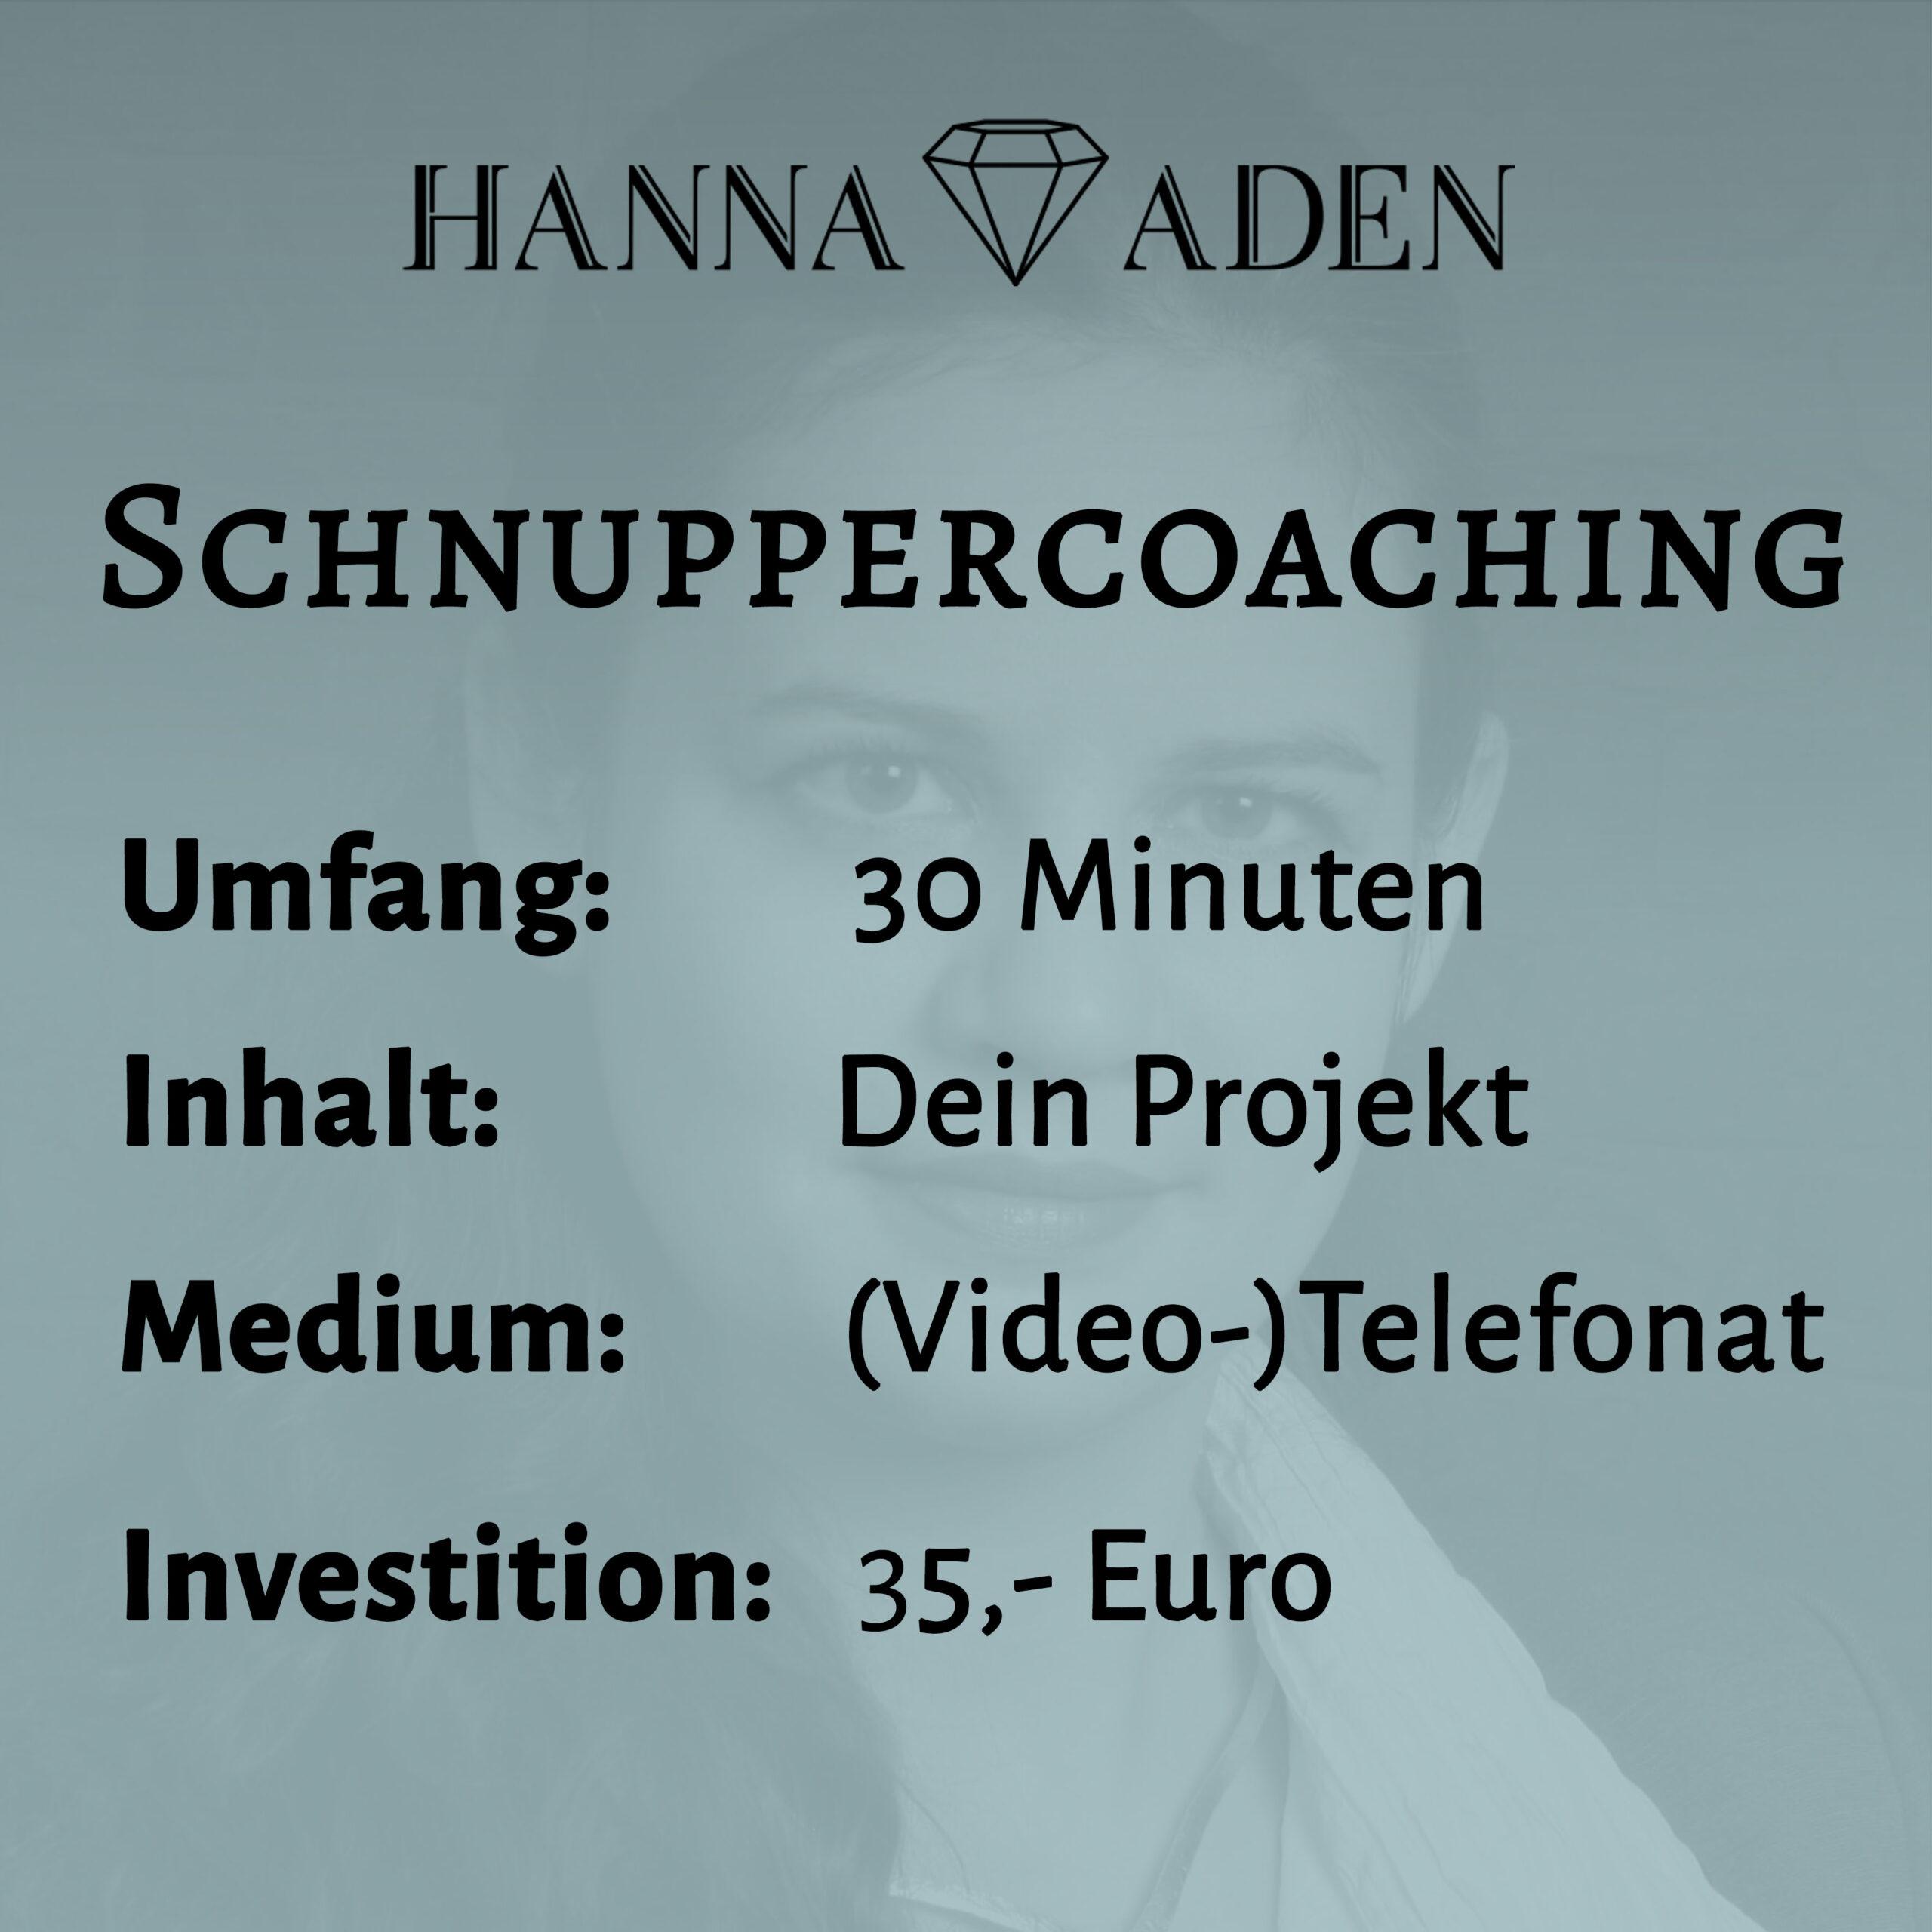 Schnuppercoaching